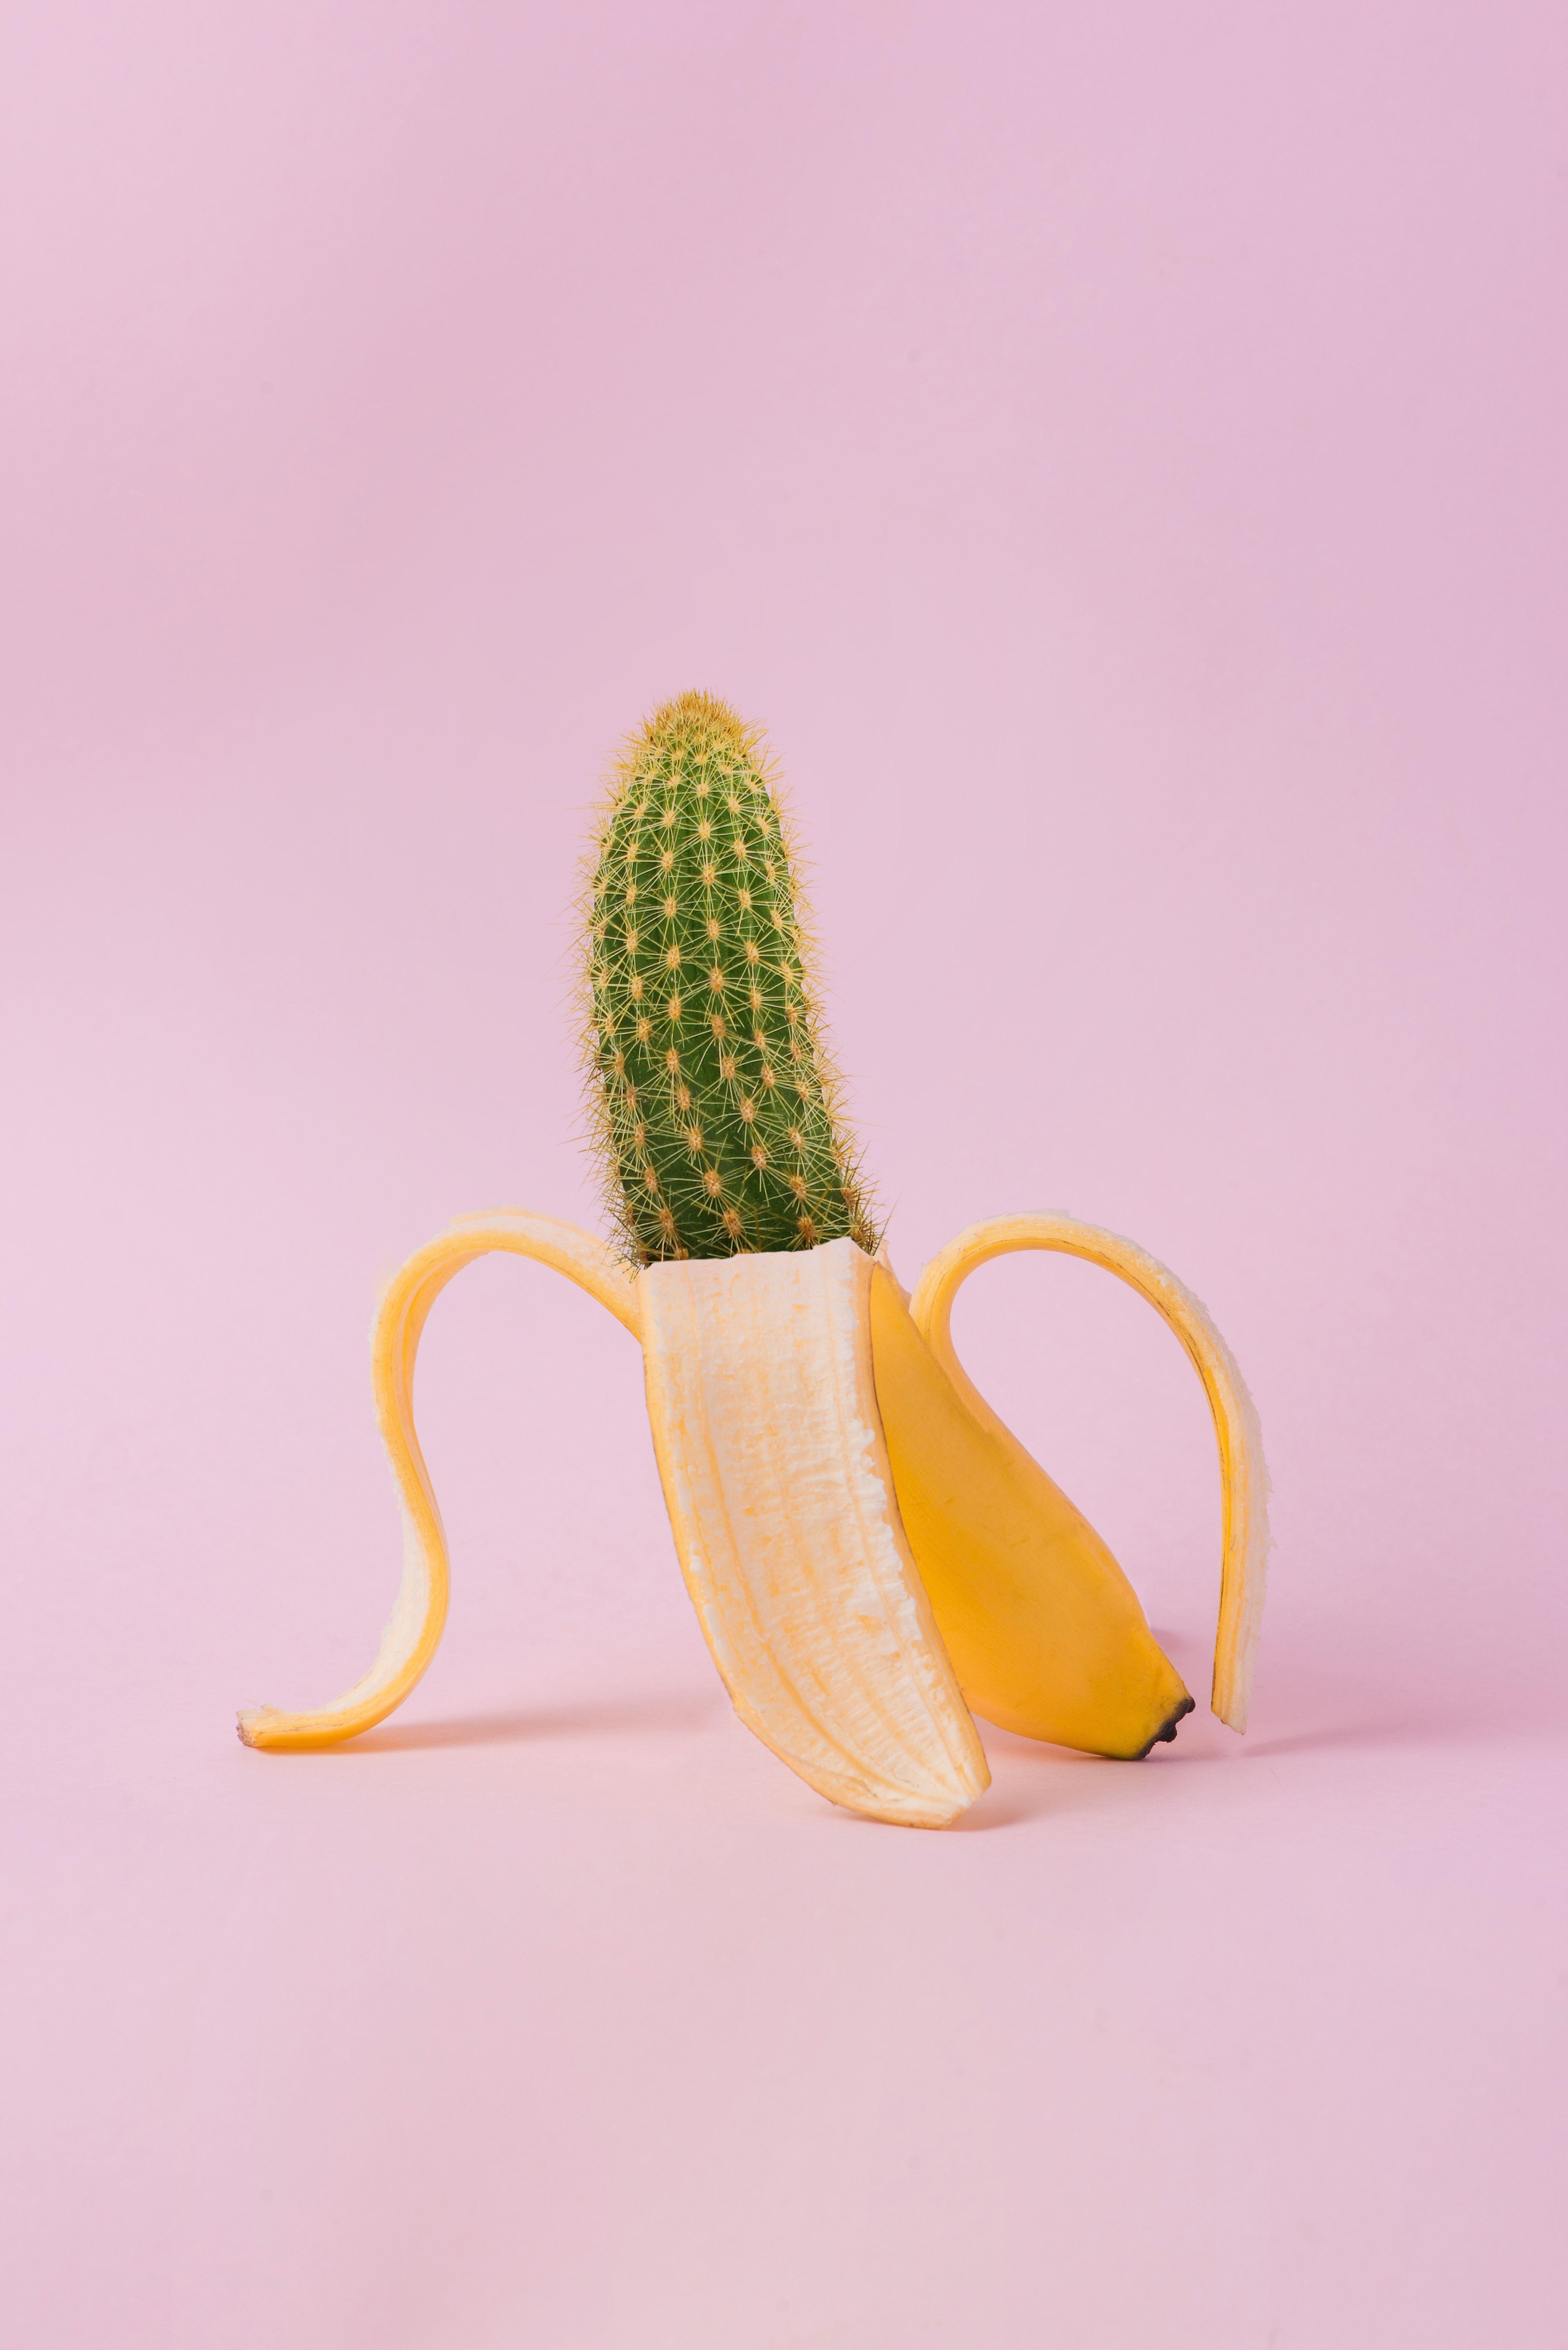 Yellow Banana Aesthetic Computer Wallpapers - Top Free ...